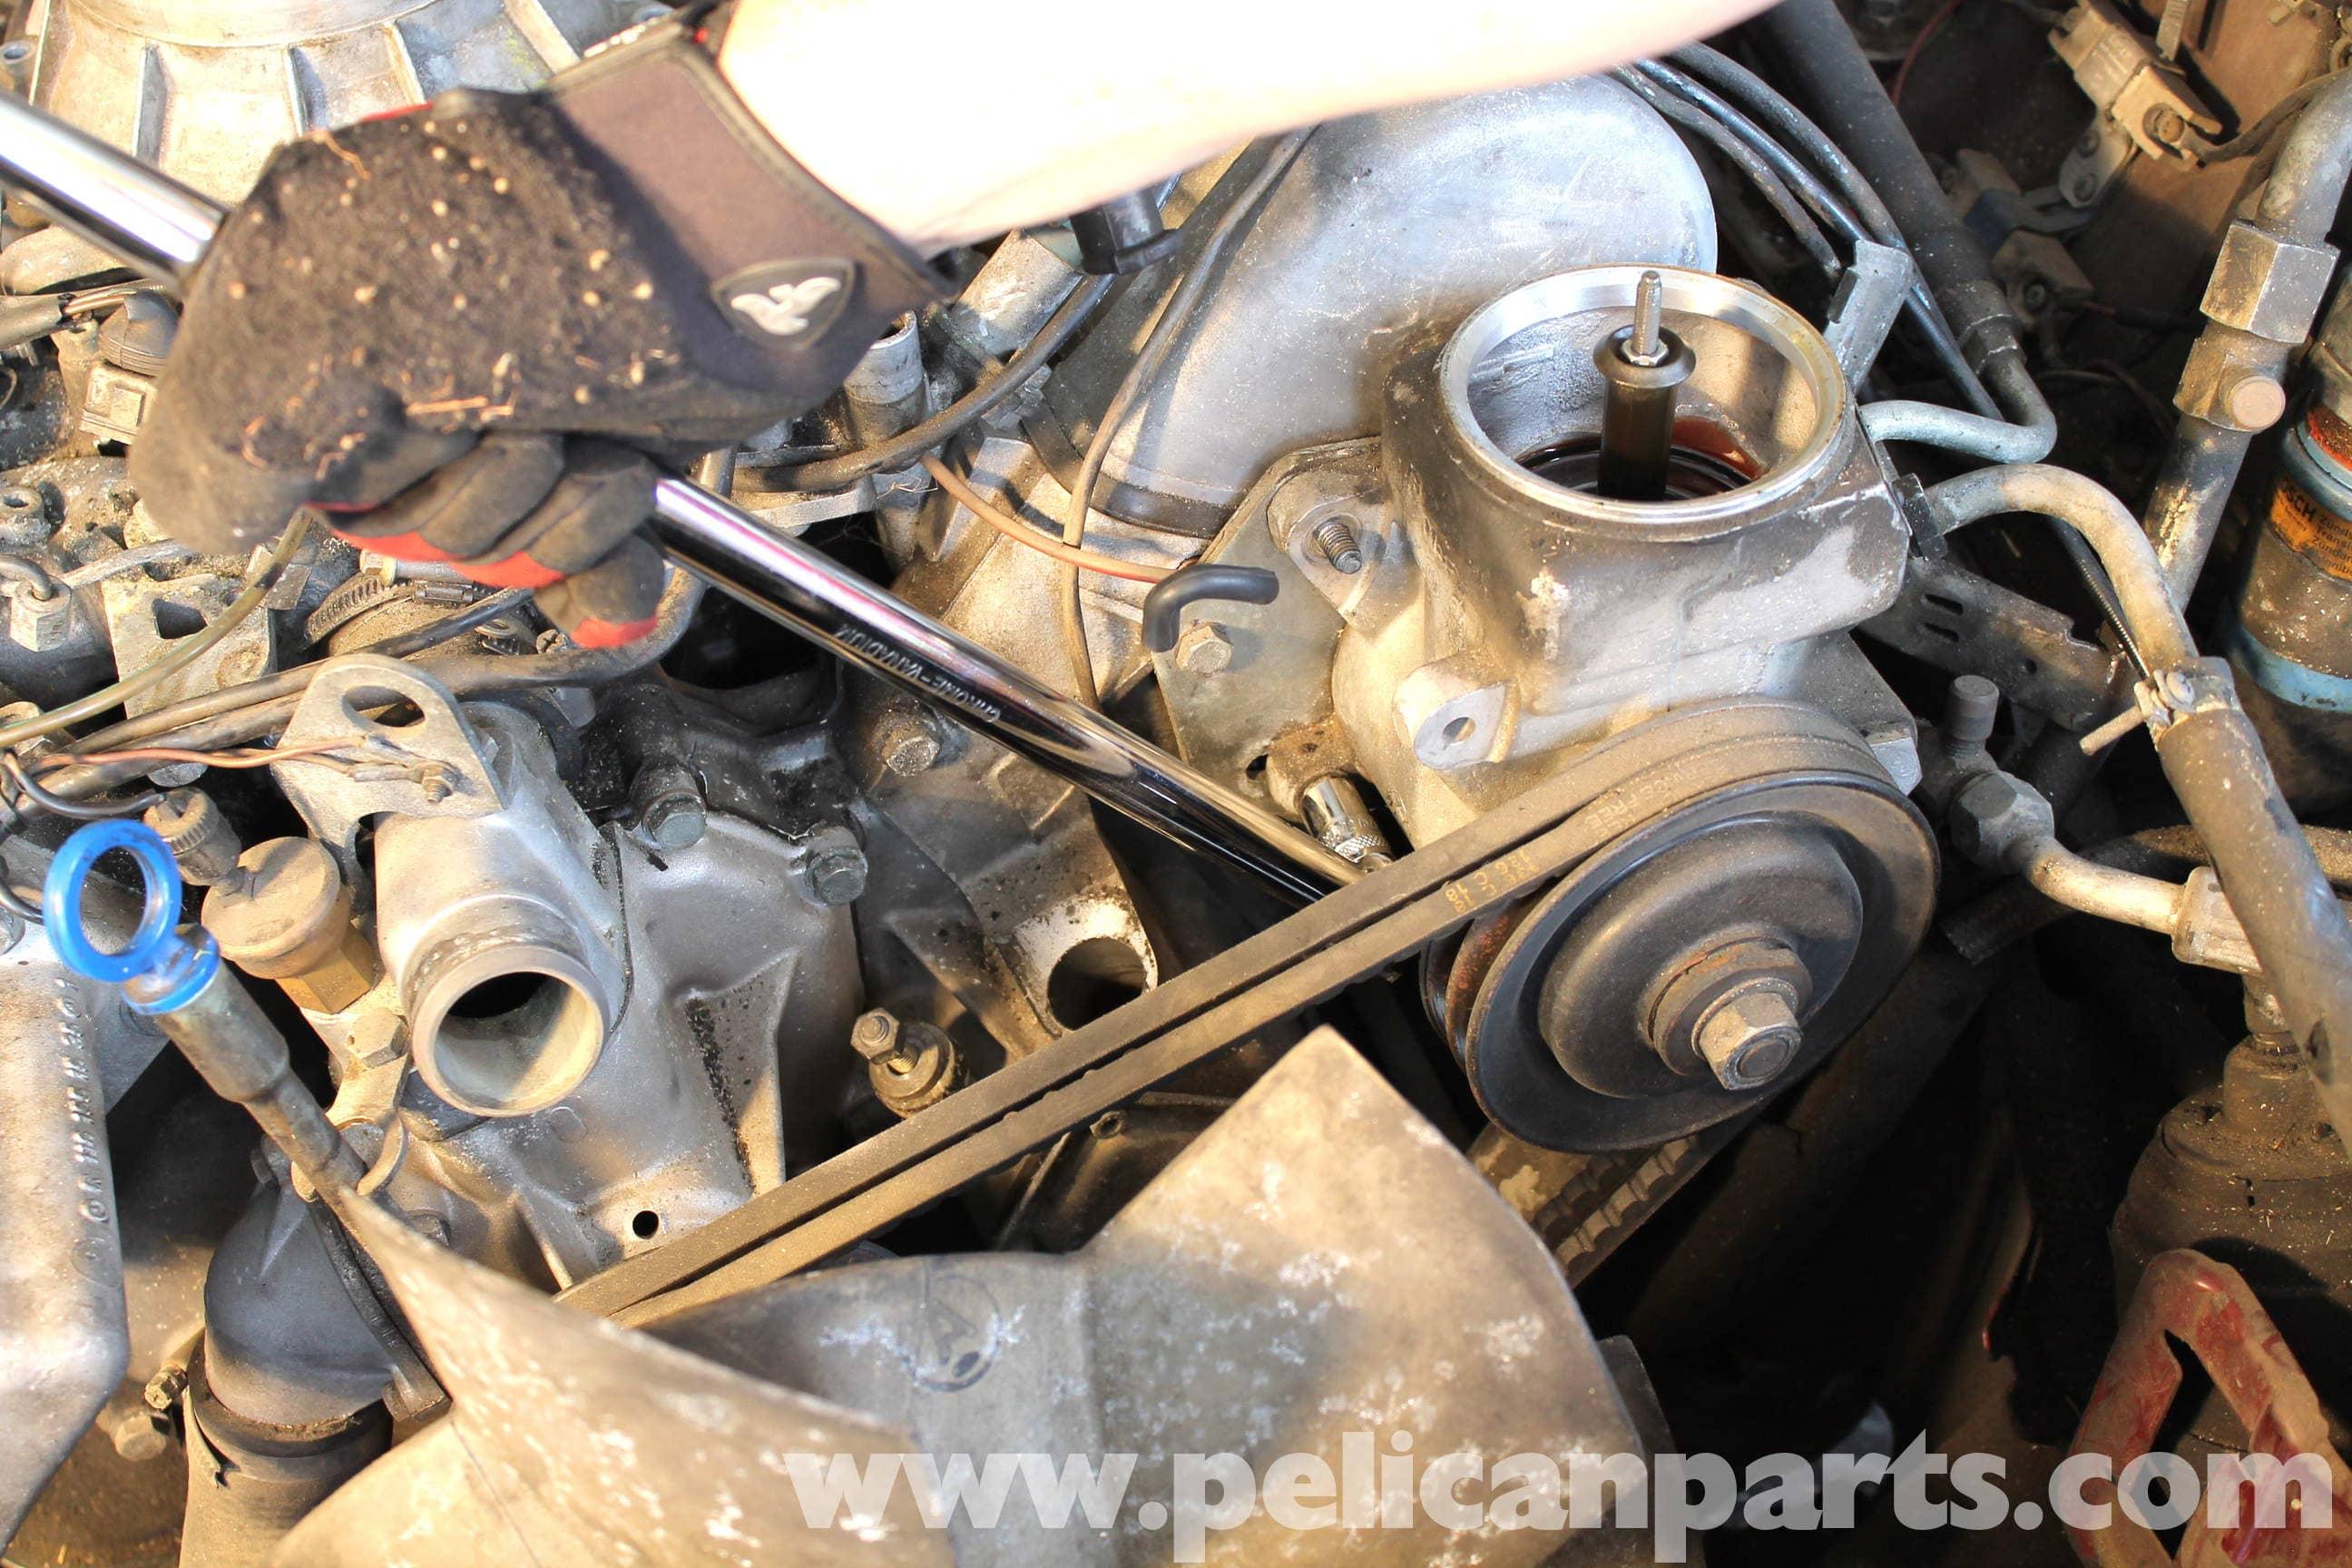 Mercedes benz r107 power steering fluid replacement 1972 for Mercedes benz ml320 power steering fluid